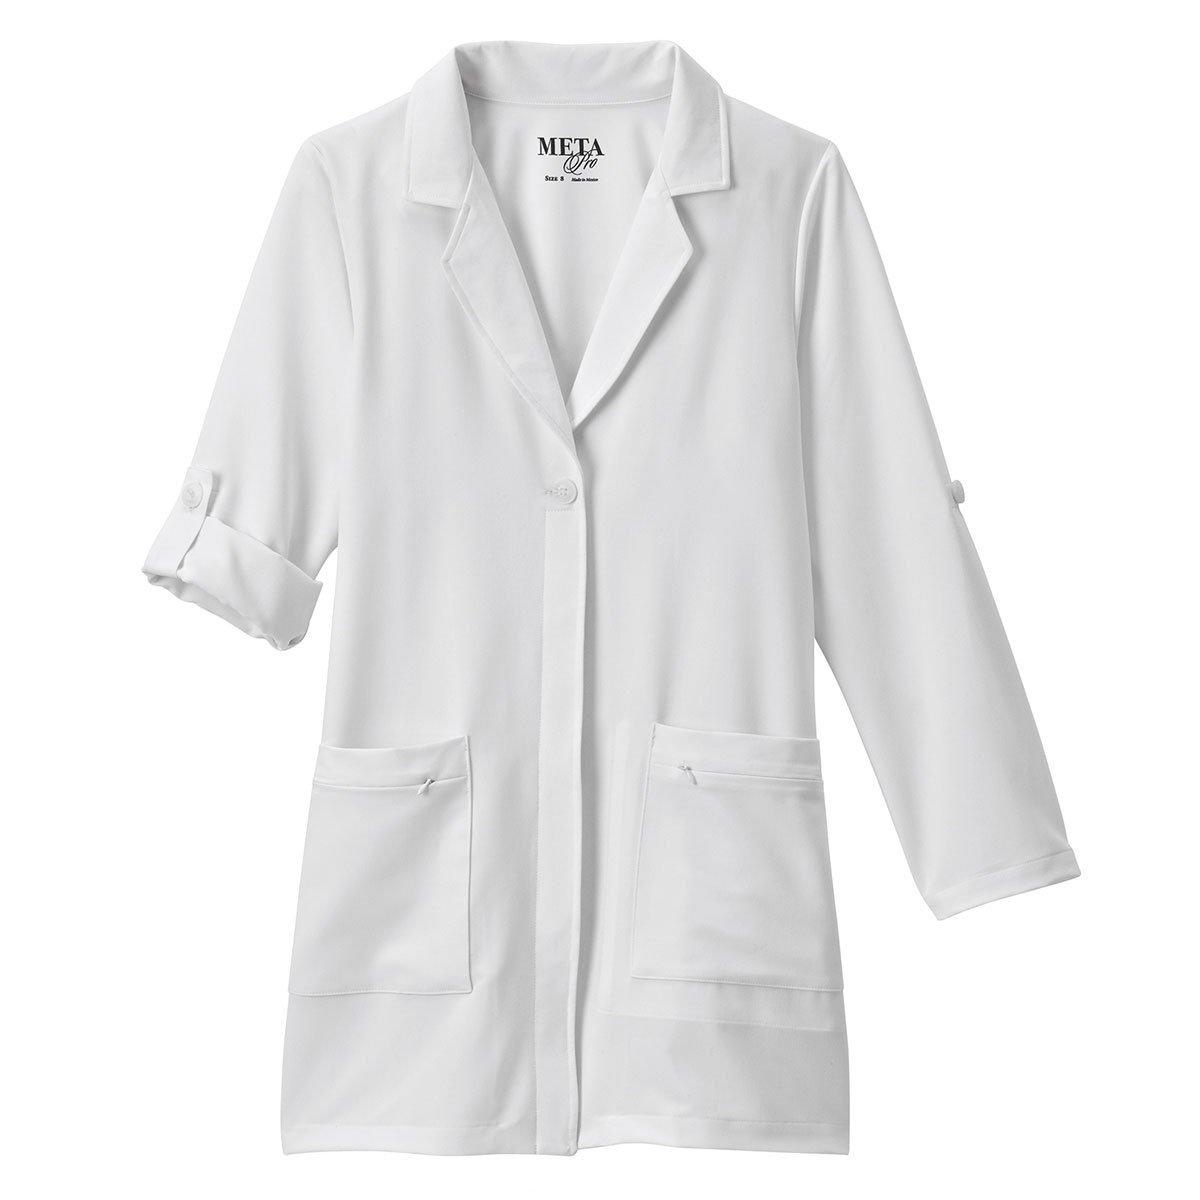 Meta Pro Labwear Women's 33''; Lab Coat White